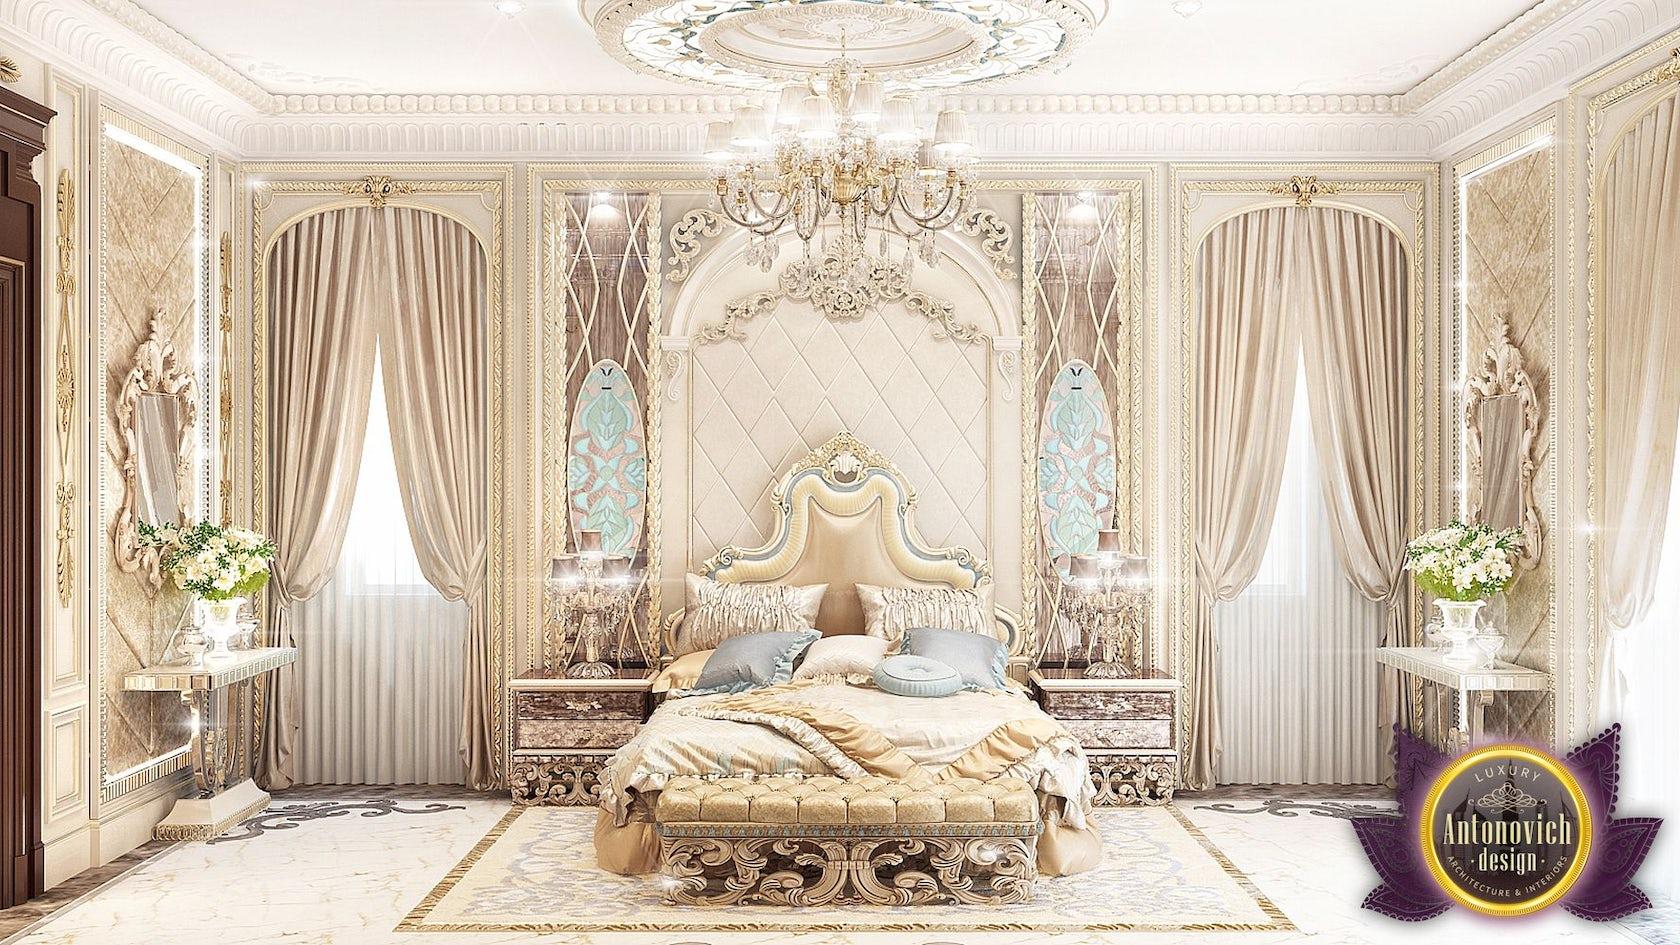 Luxury Royal Arabic Master Bedroom Of Luxury Antonovich Design By Luxury Antonovich Design Architizer